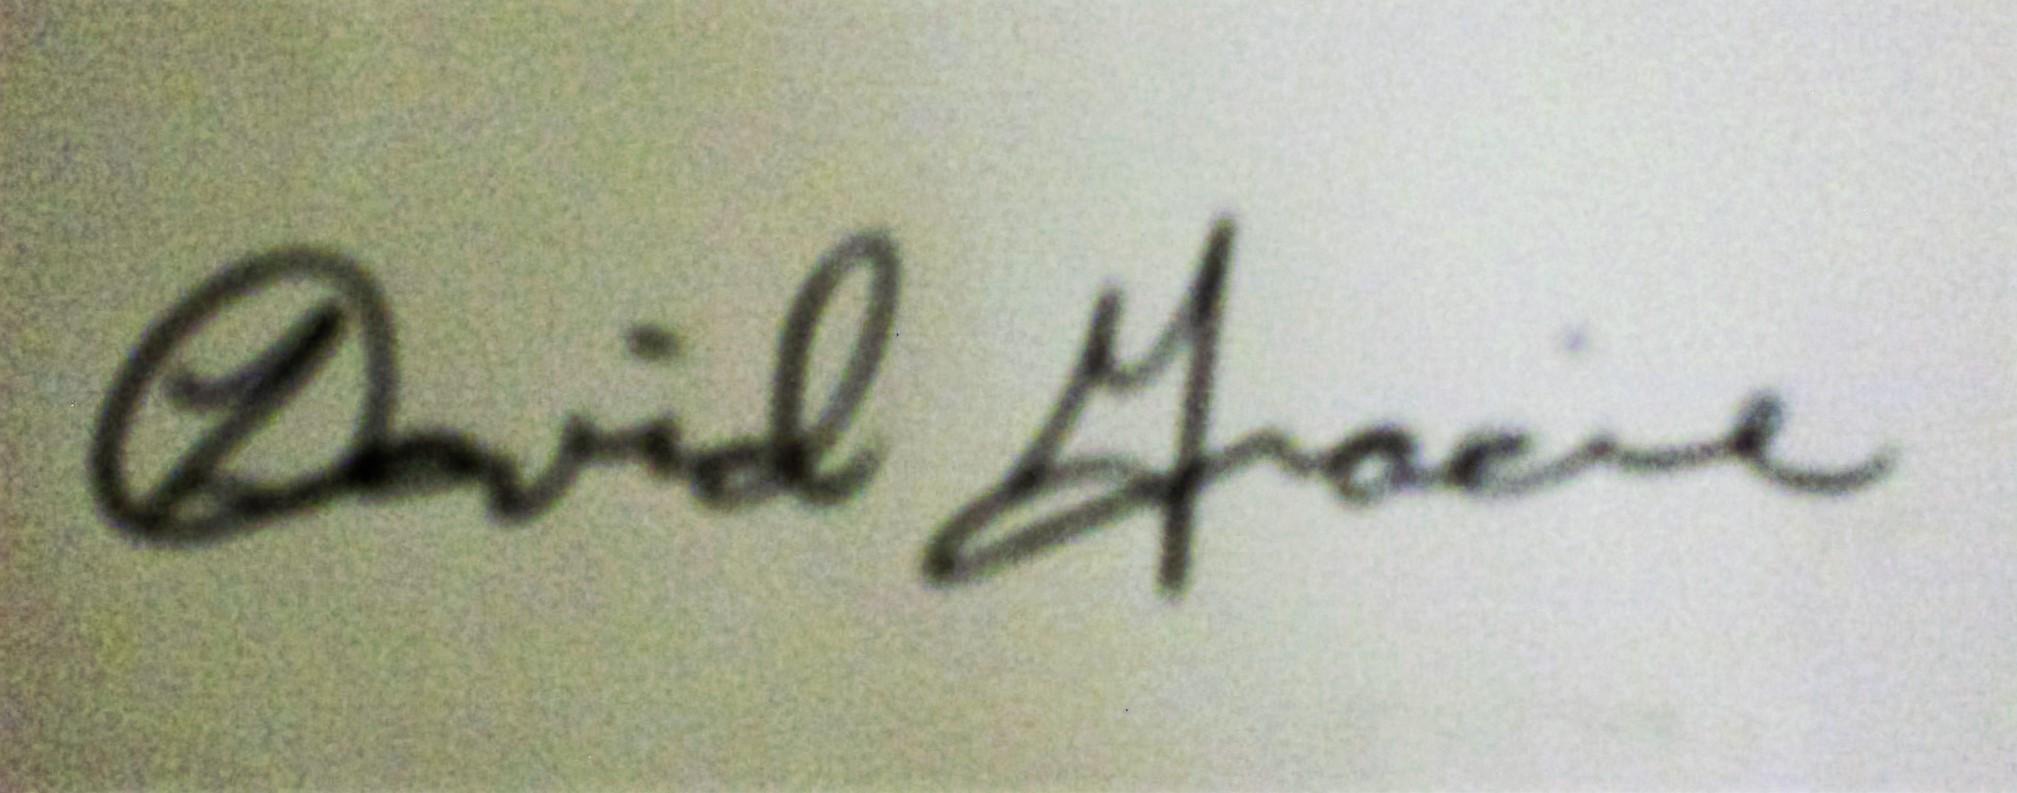 David Gracie's Signature